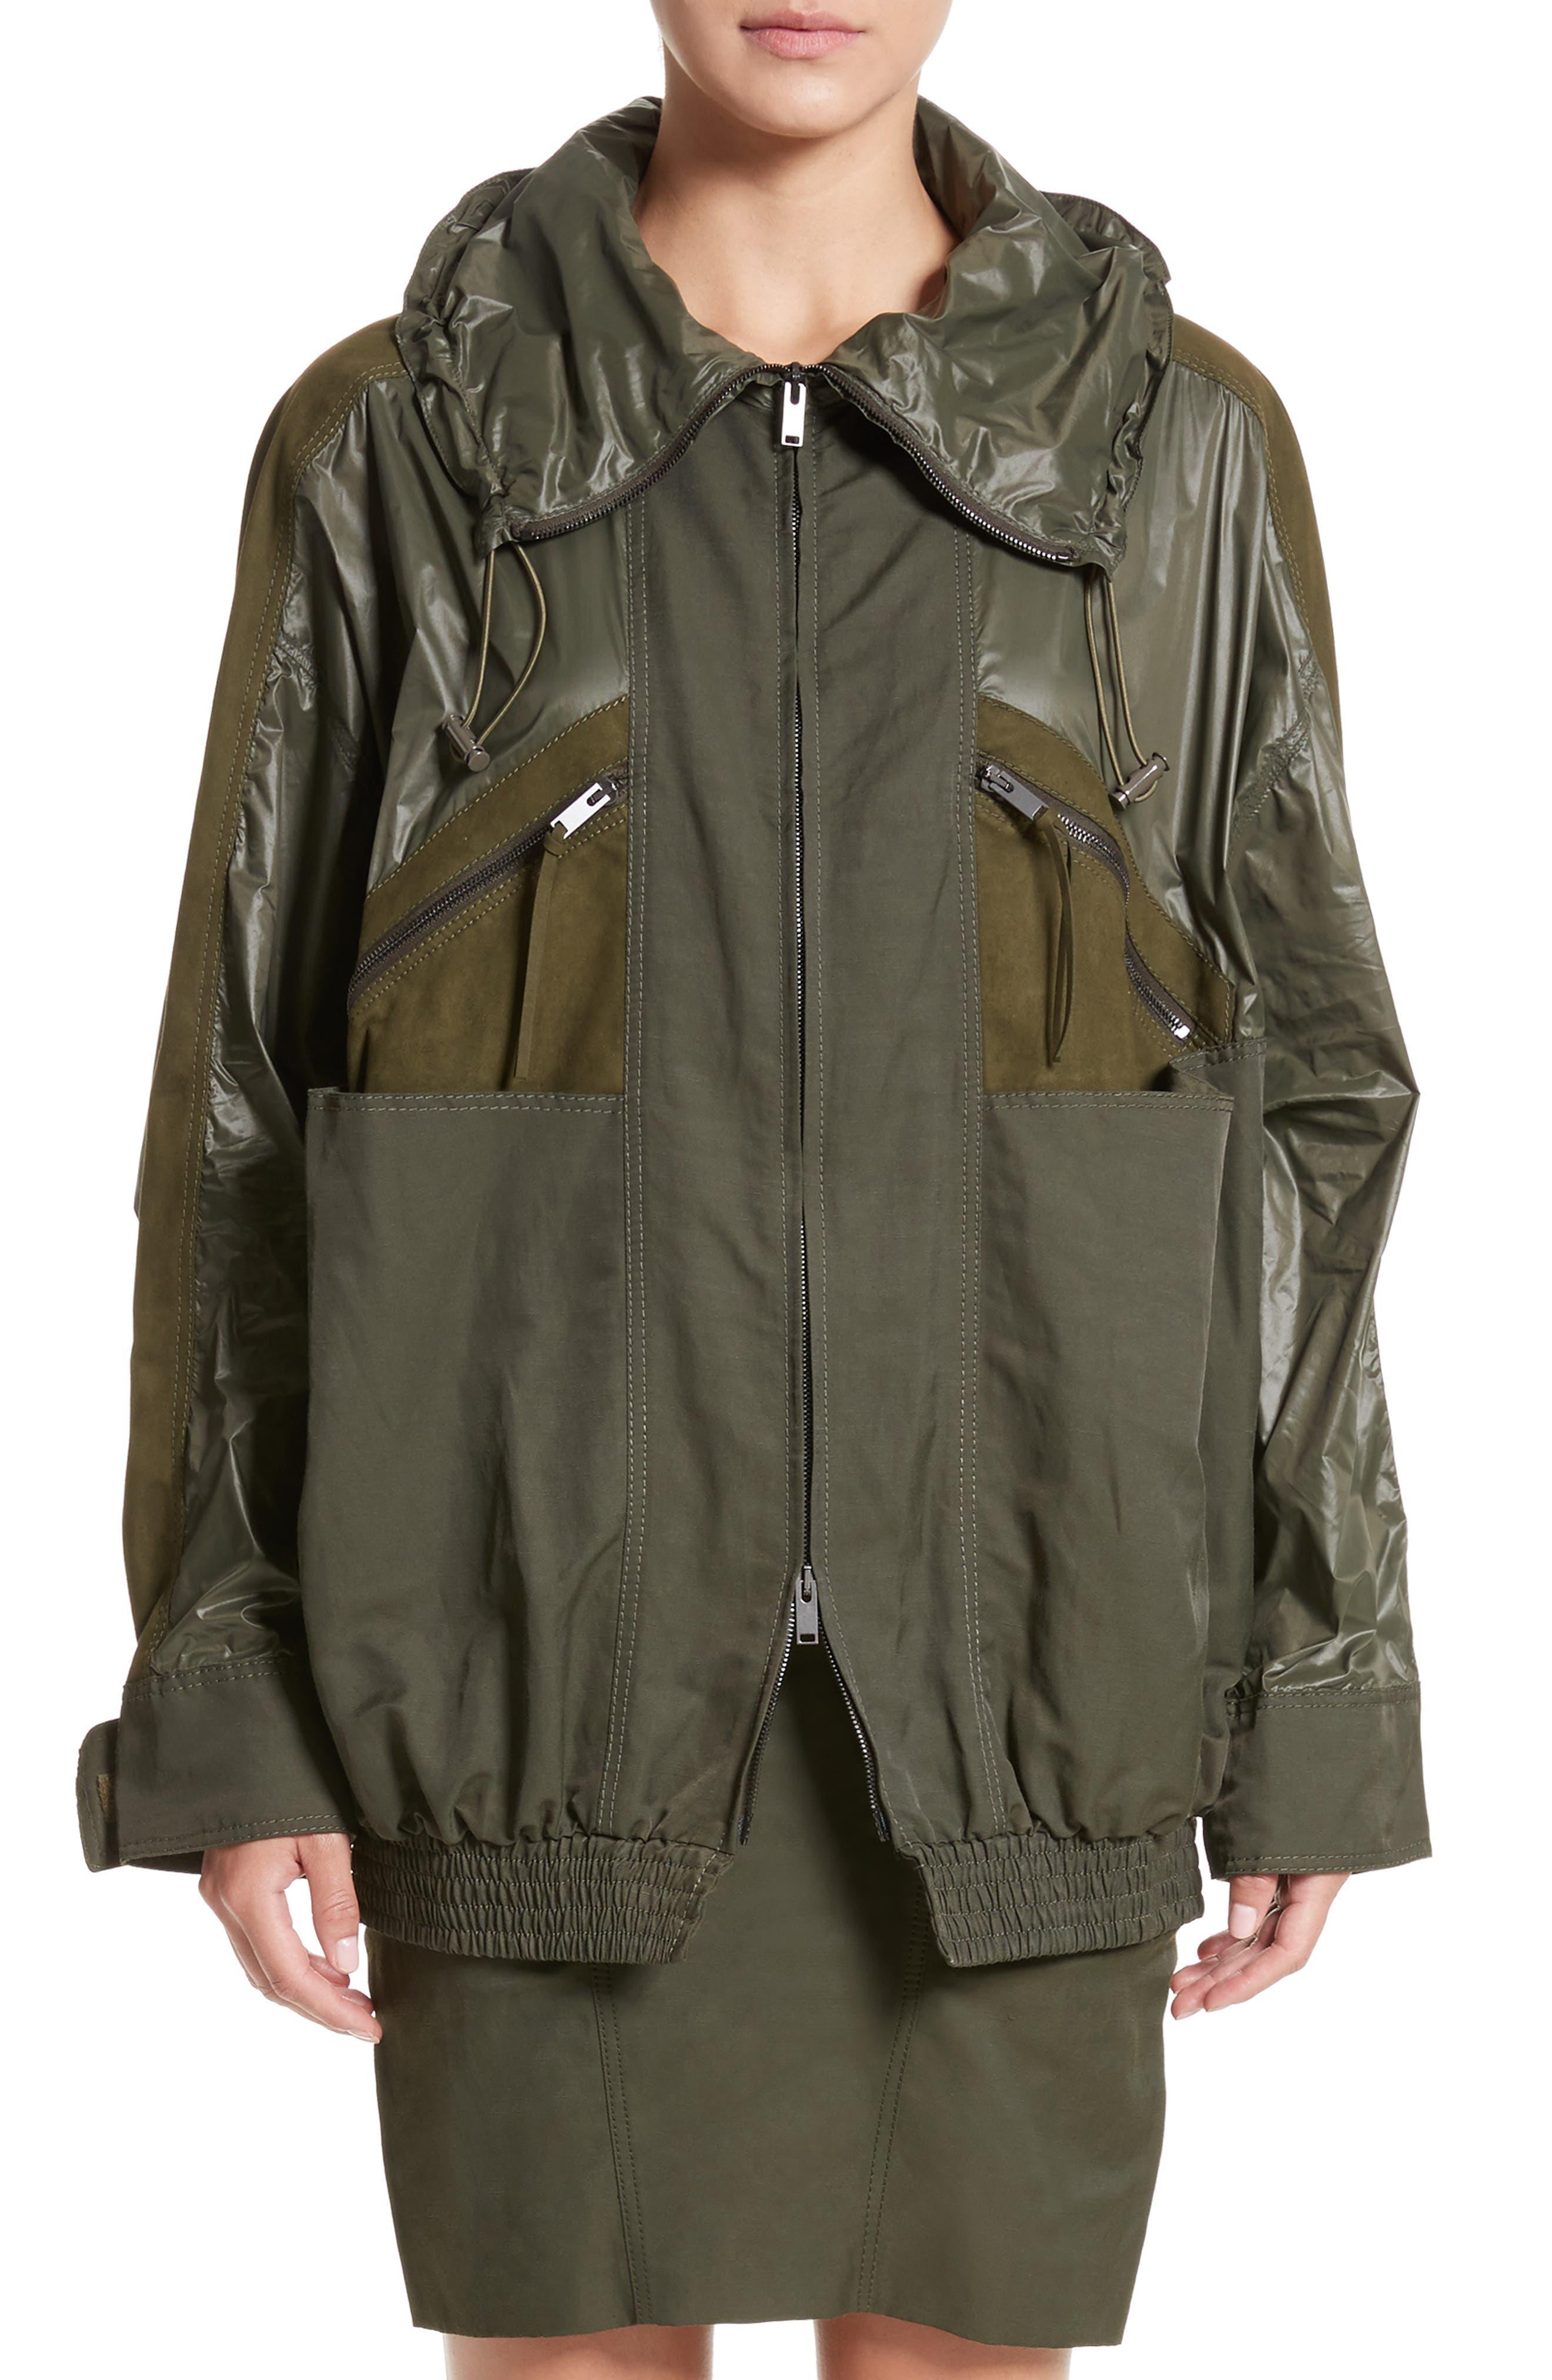 Alter Suede Trim Windbreaker Jacket,                         Main,                         color, Loden